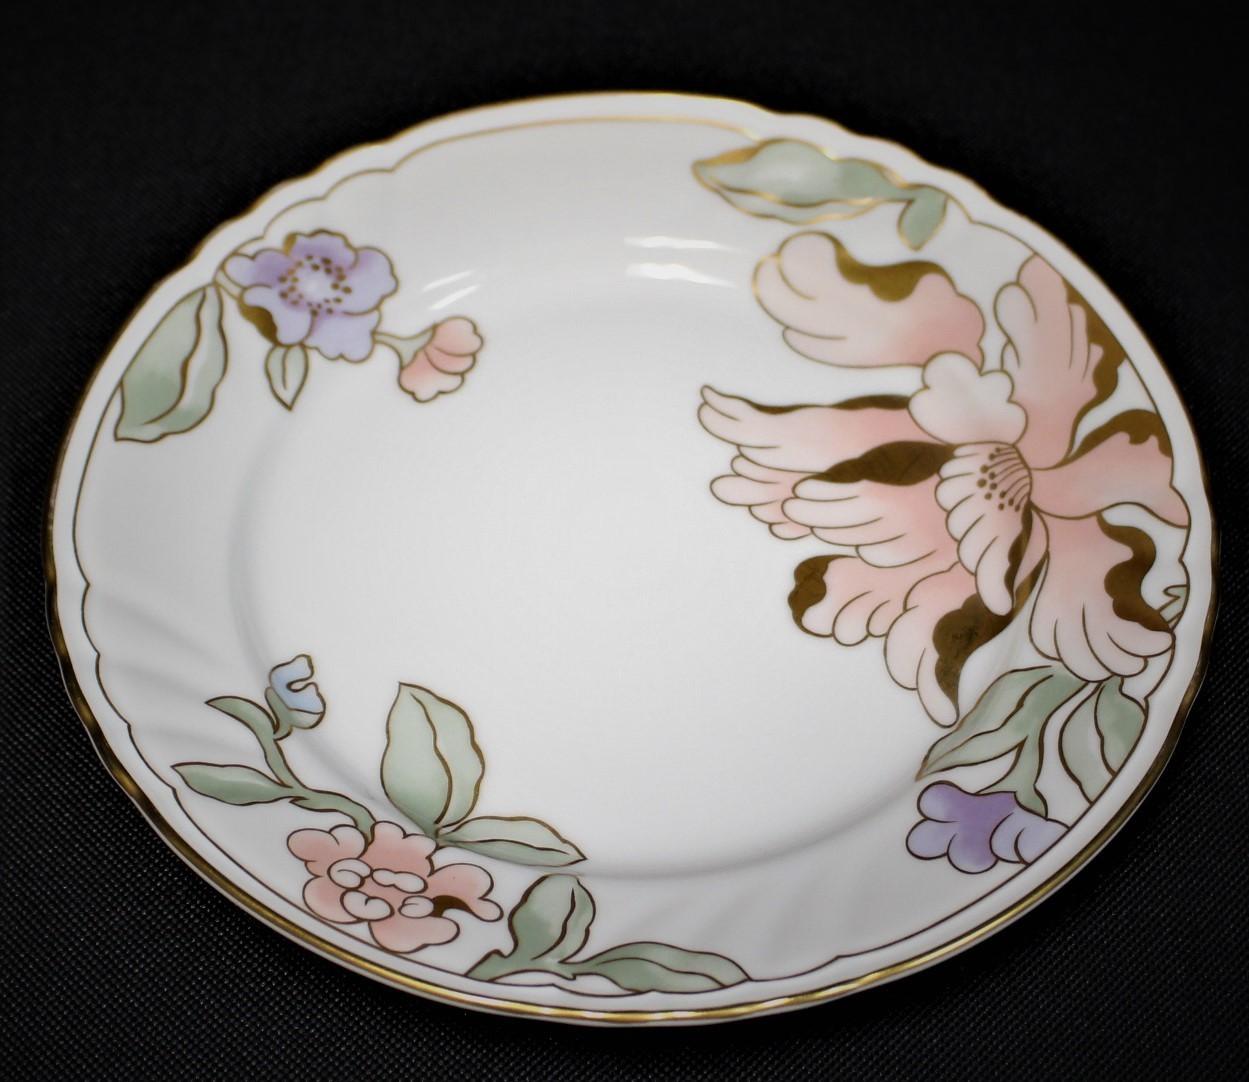 Fitz & Floyd Fleur Fantasia 194 Peach & Purple Floral 7.5